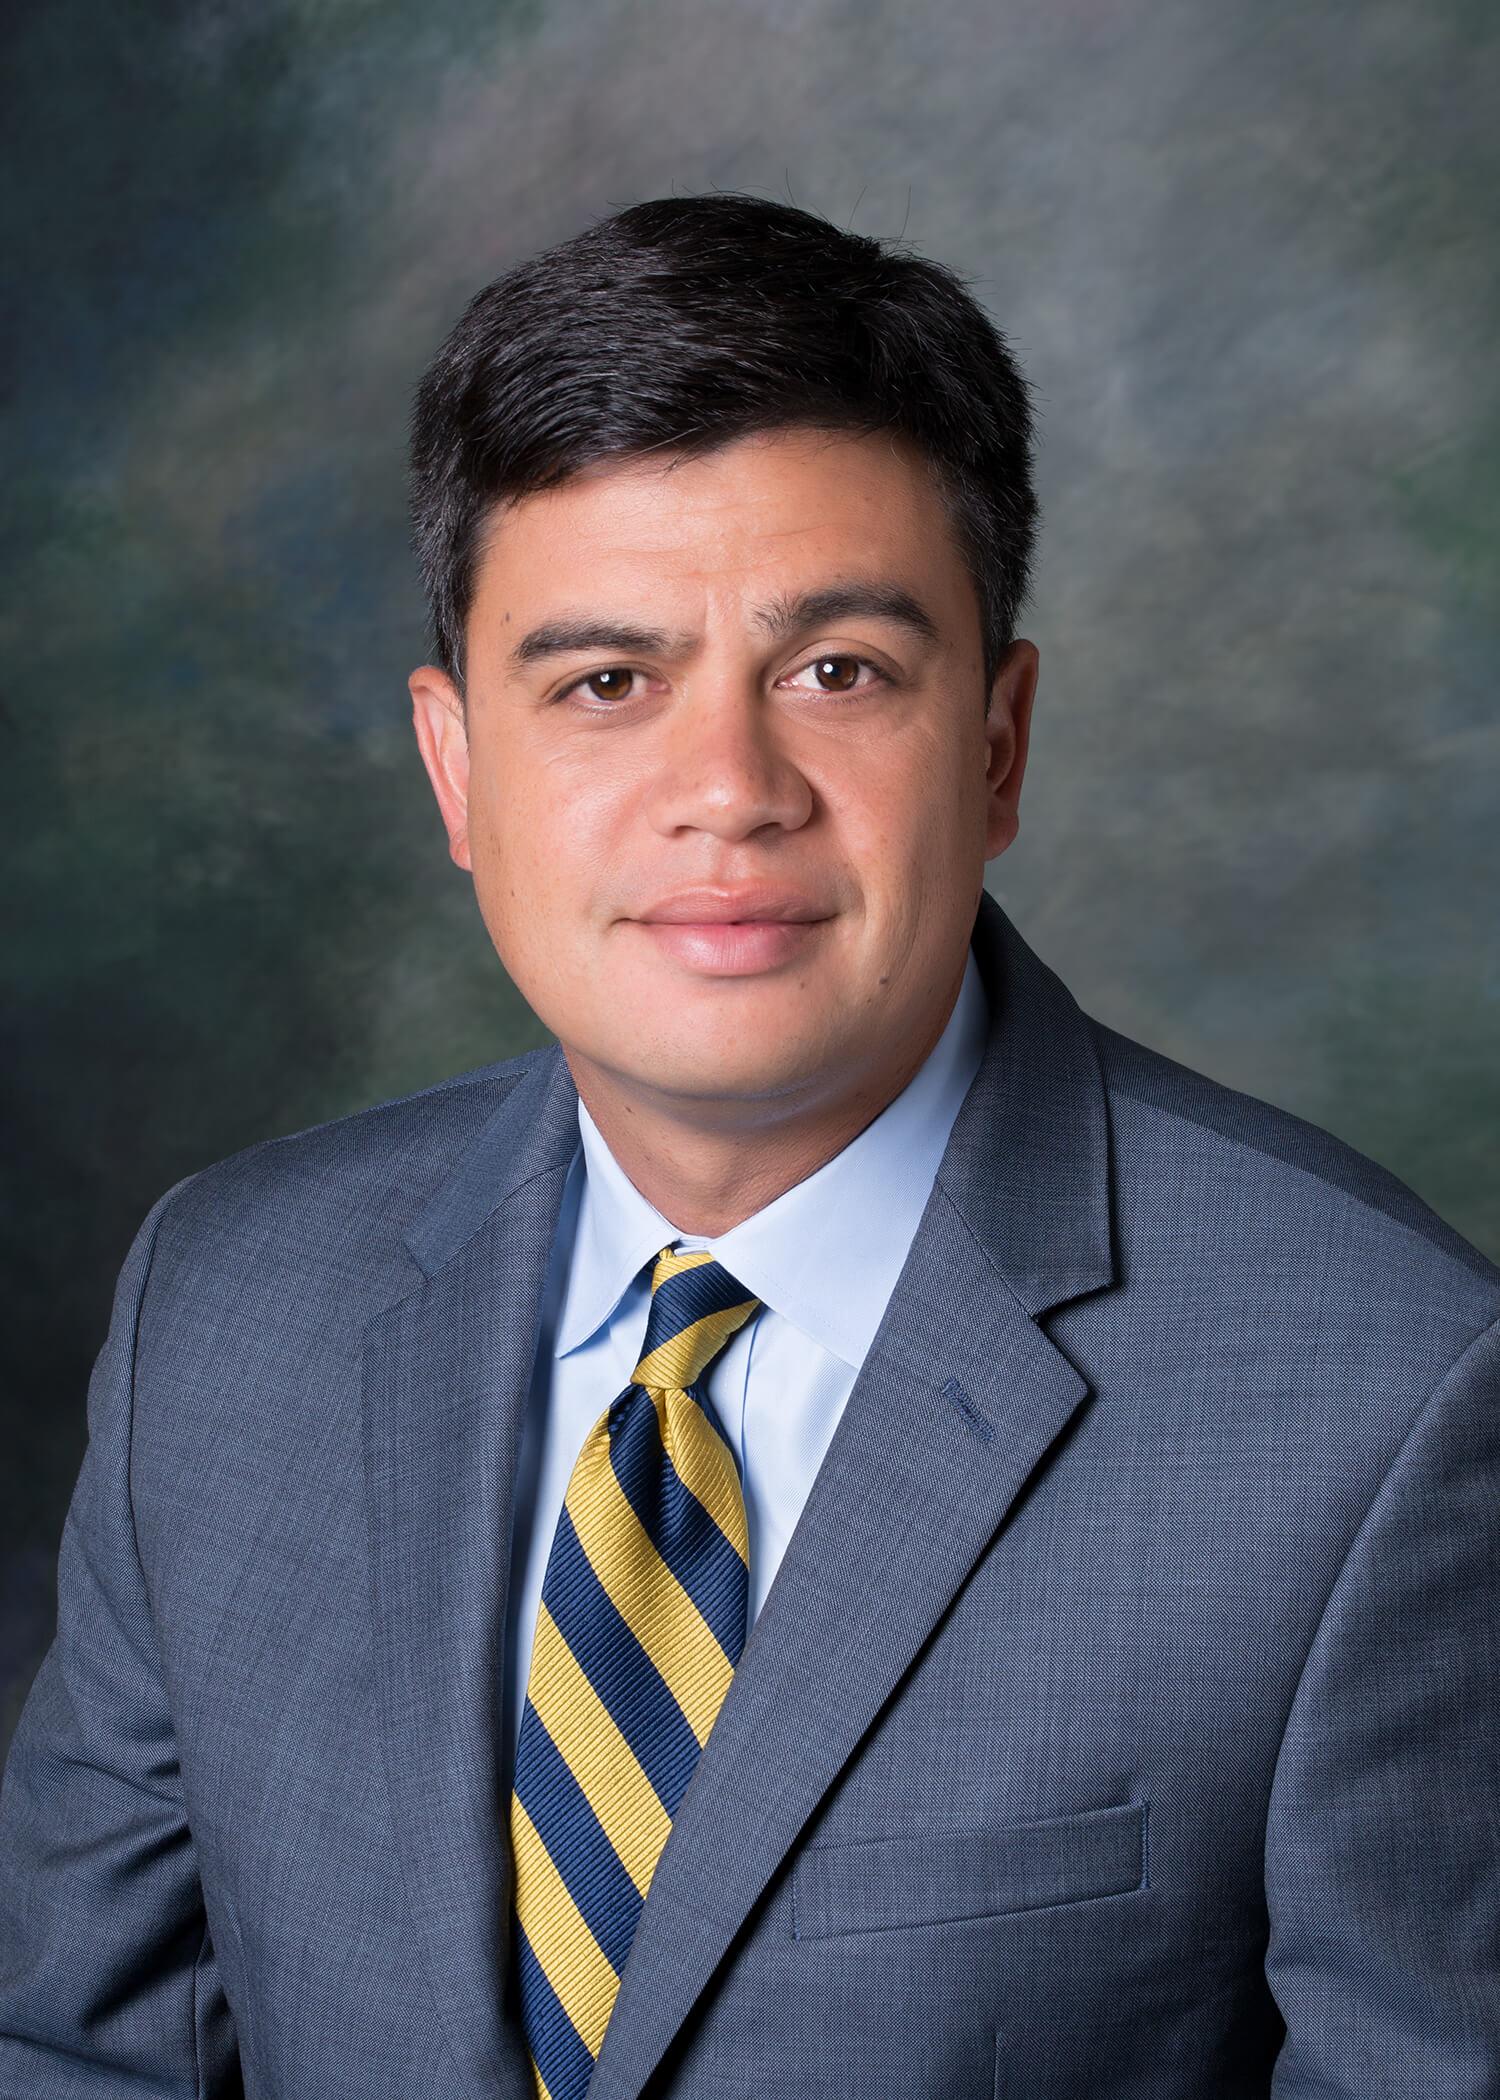 Zachery Groves 2020-Domestic Partner and Senior Litigator